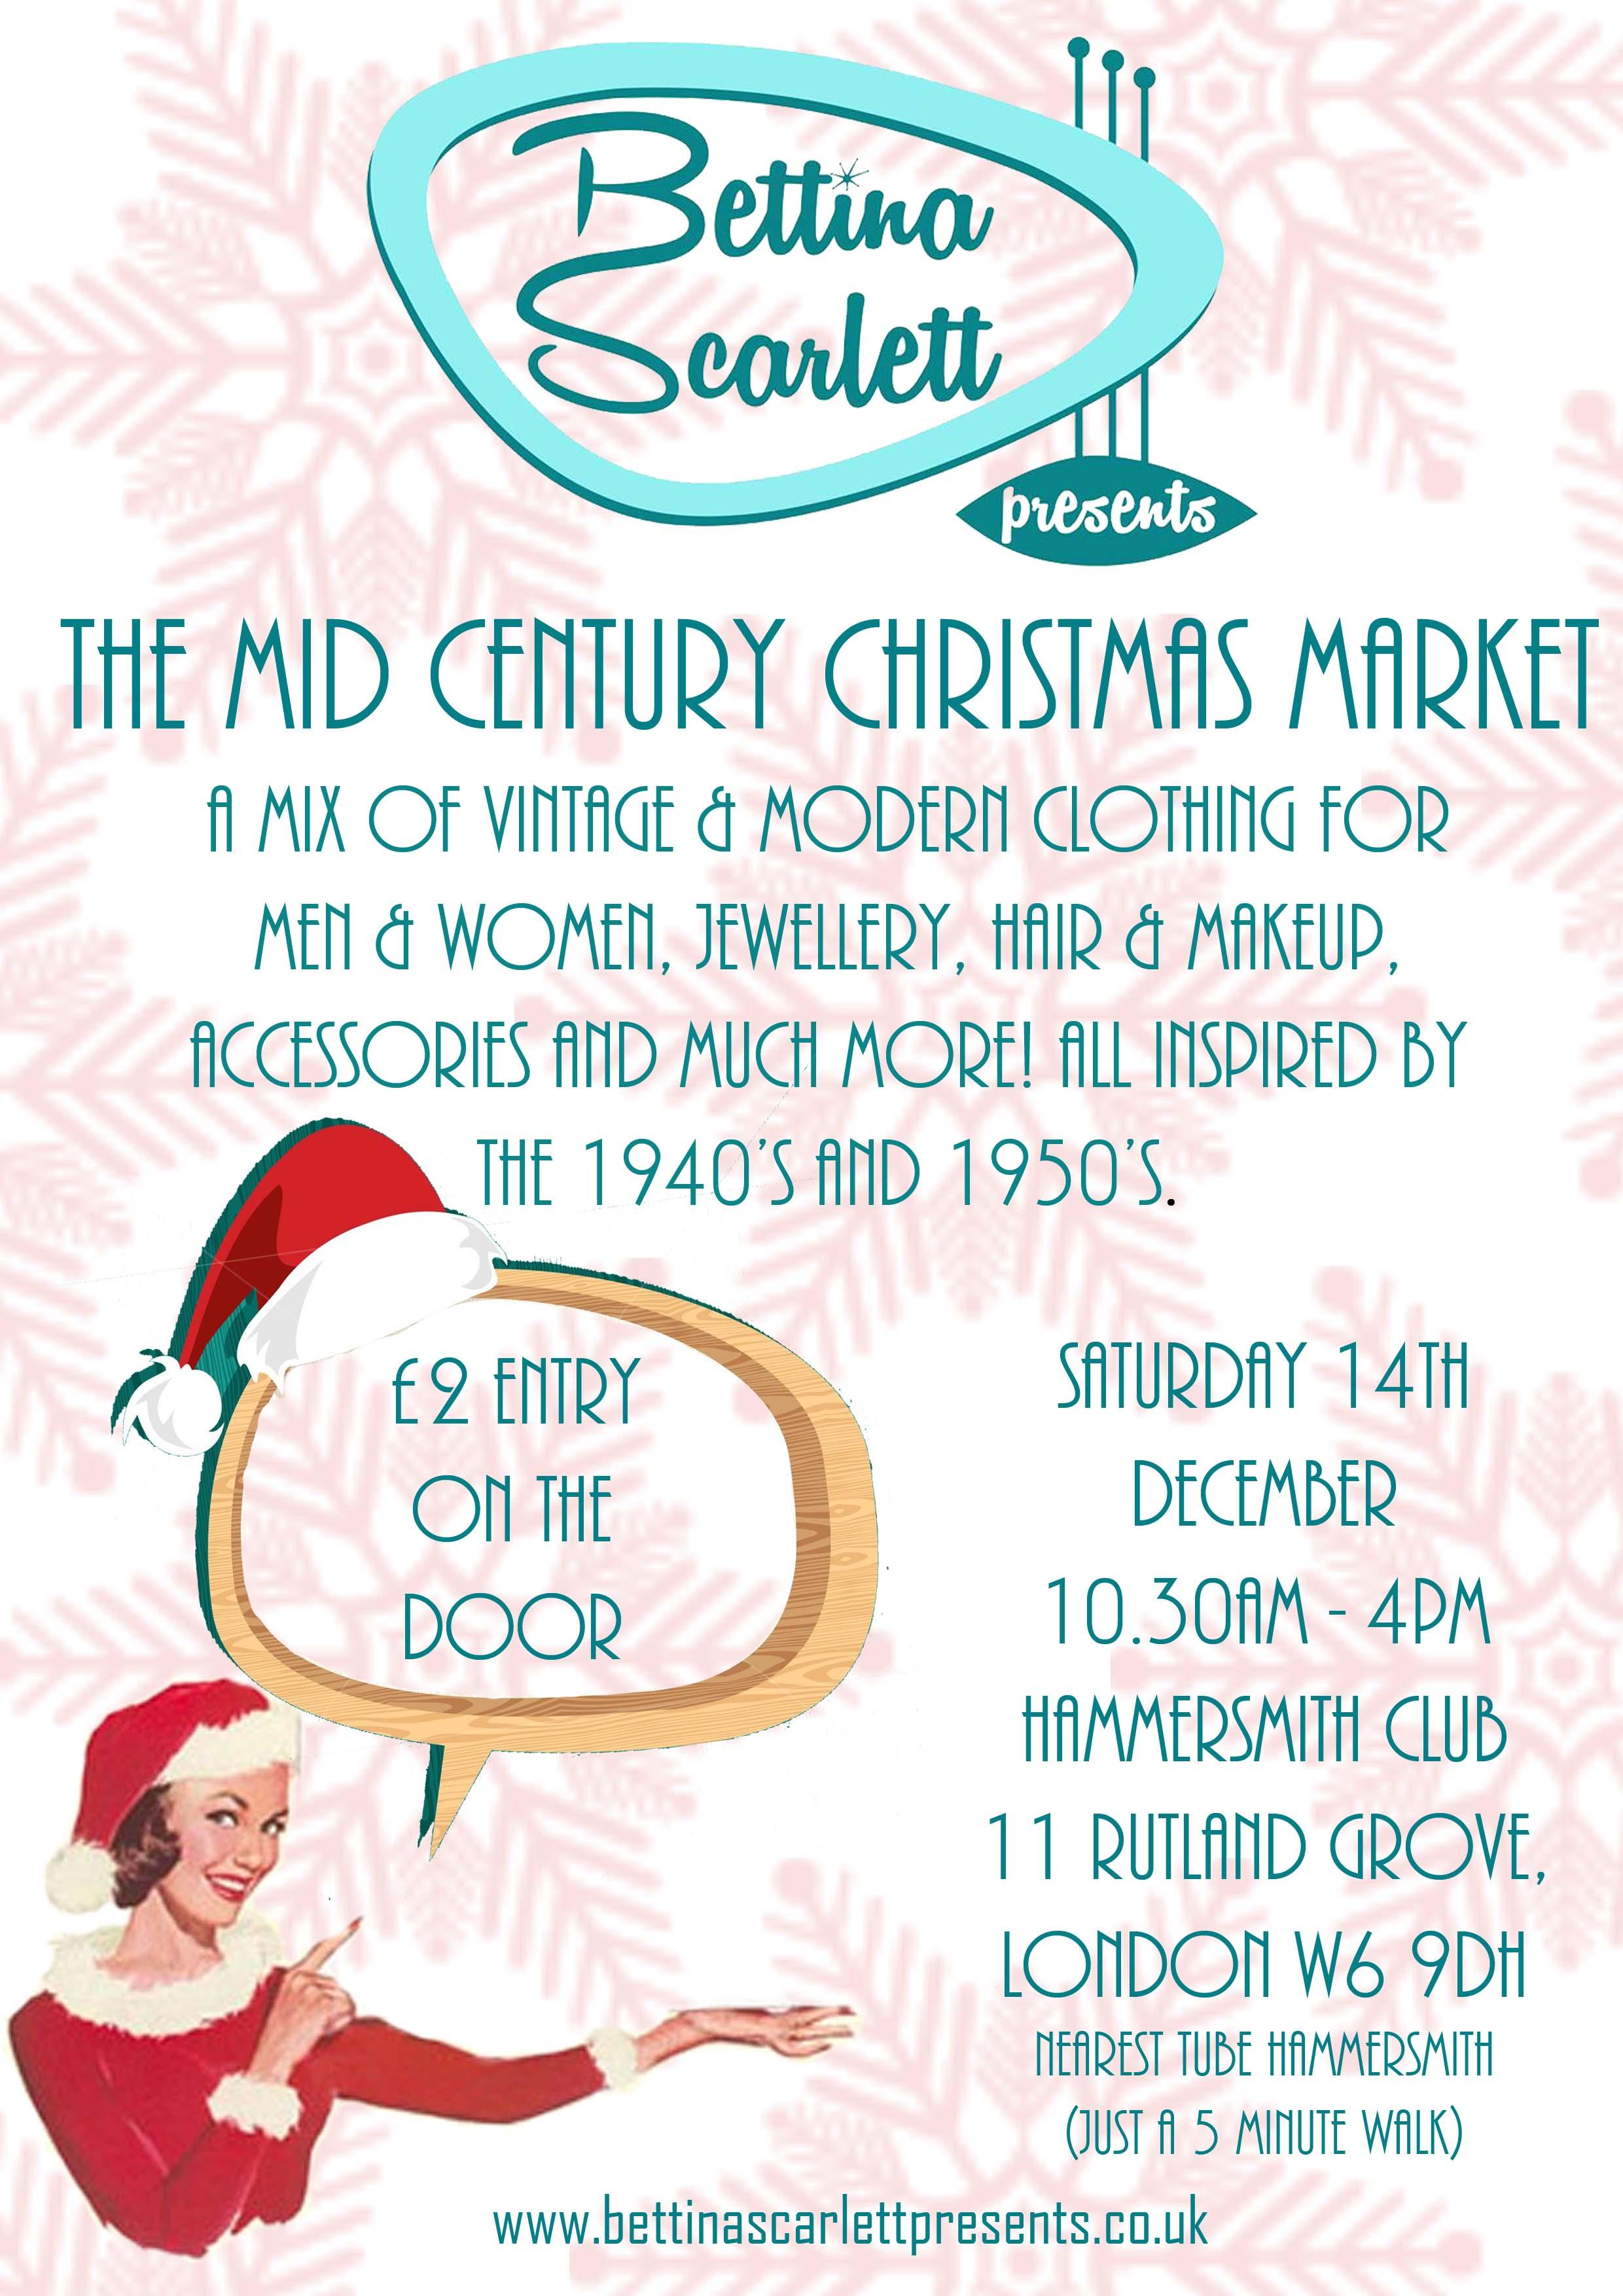 The Mid Century Christmas Market